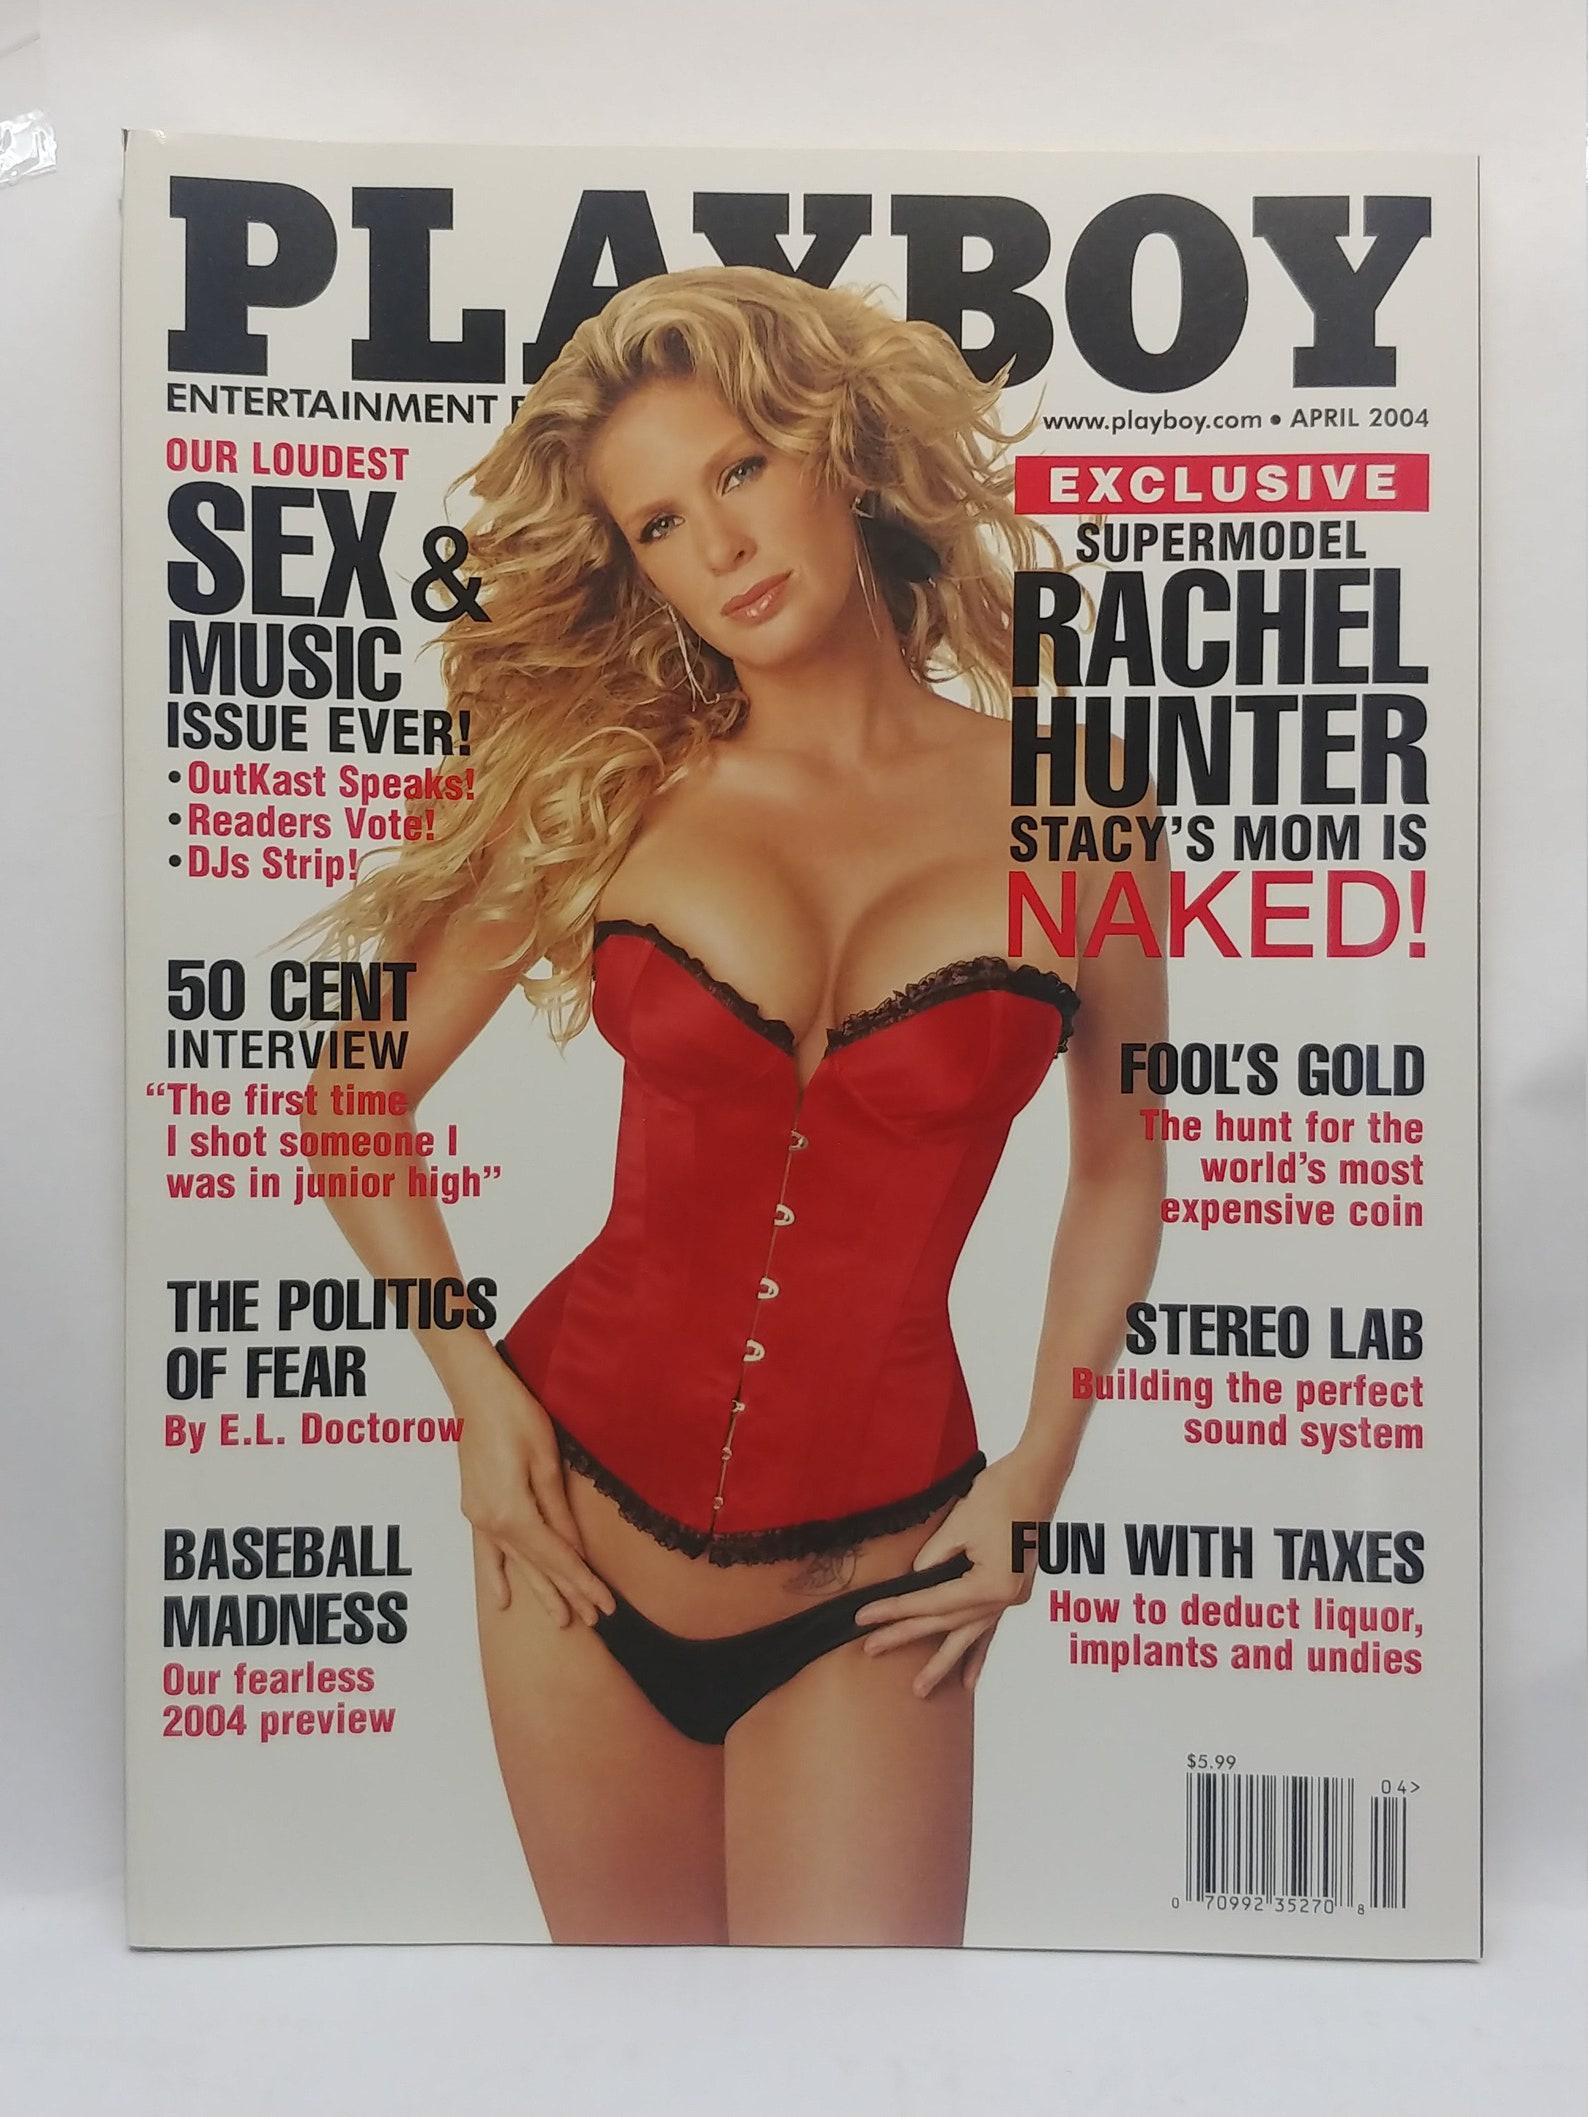 Playboy Magazine April 2004 With Supermodel Rachel Hunter